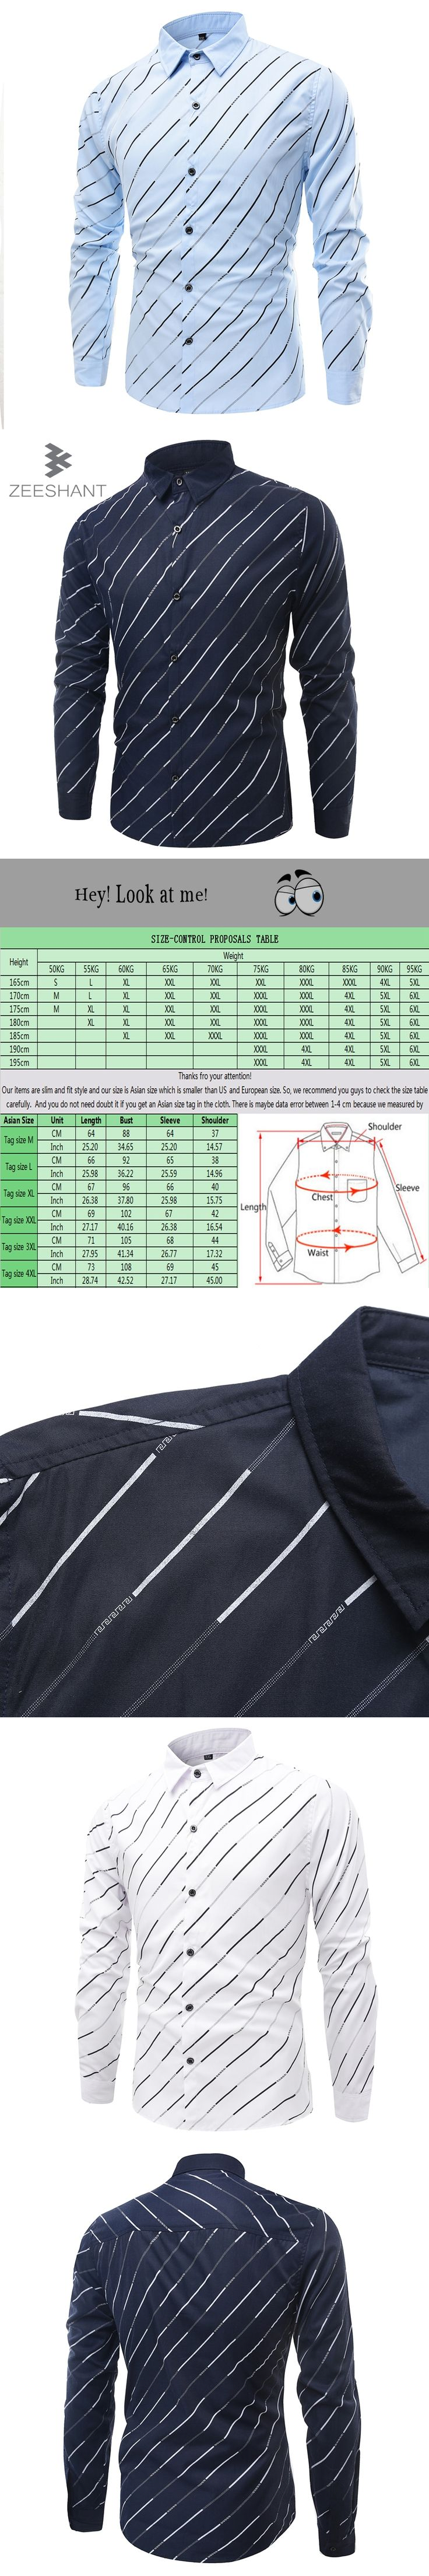 ZEESHANT Tuxedo Shirt XXXXL Striped Dress Shirts Regular Fit Business Casual Button-down Shirt Work Wear in Men's Tuxedo Shirts